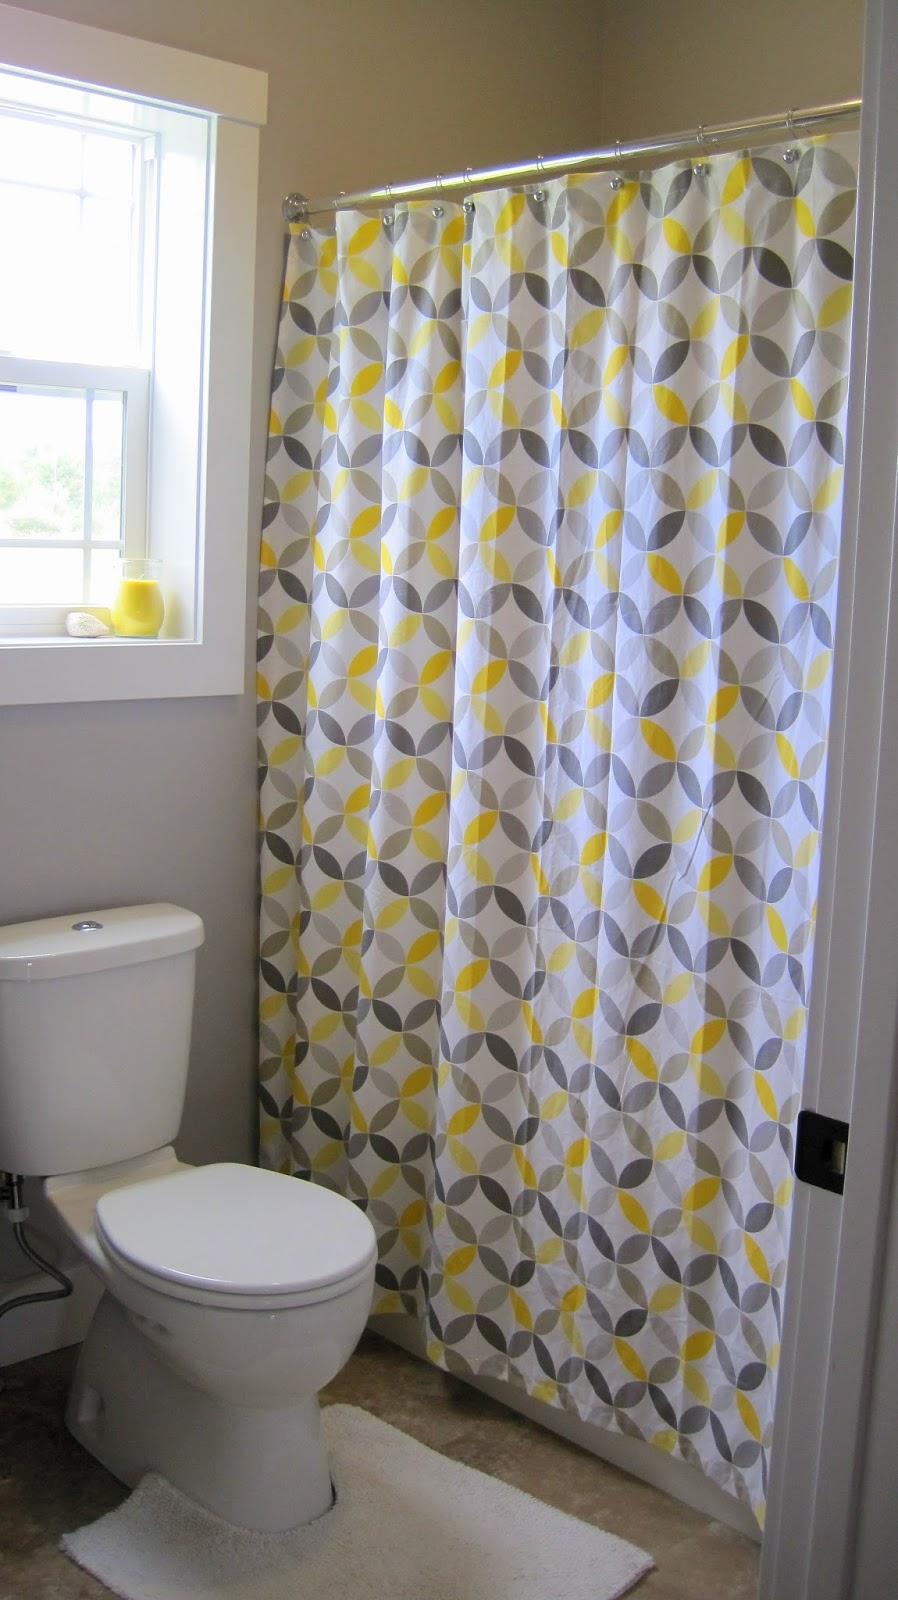 I Married a Tree Hugger: Cheery Yellow and Grey Bathroom